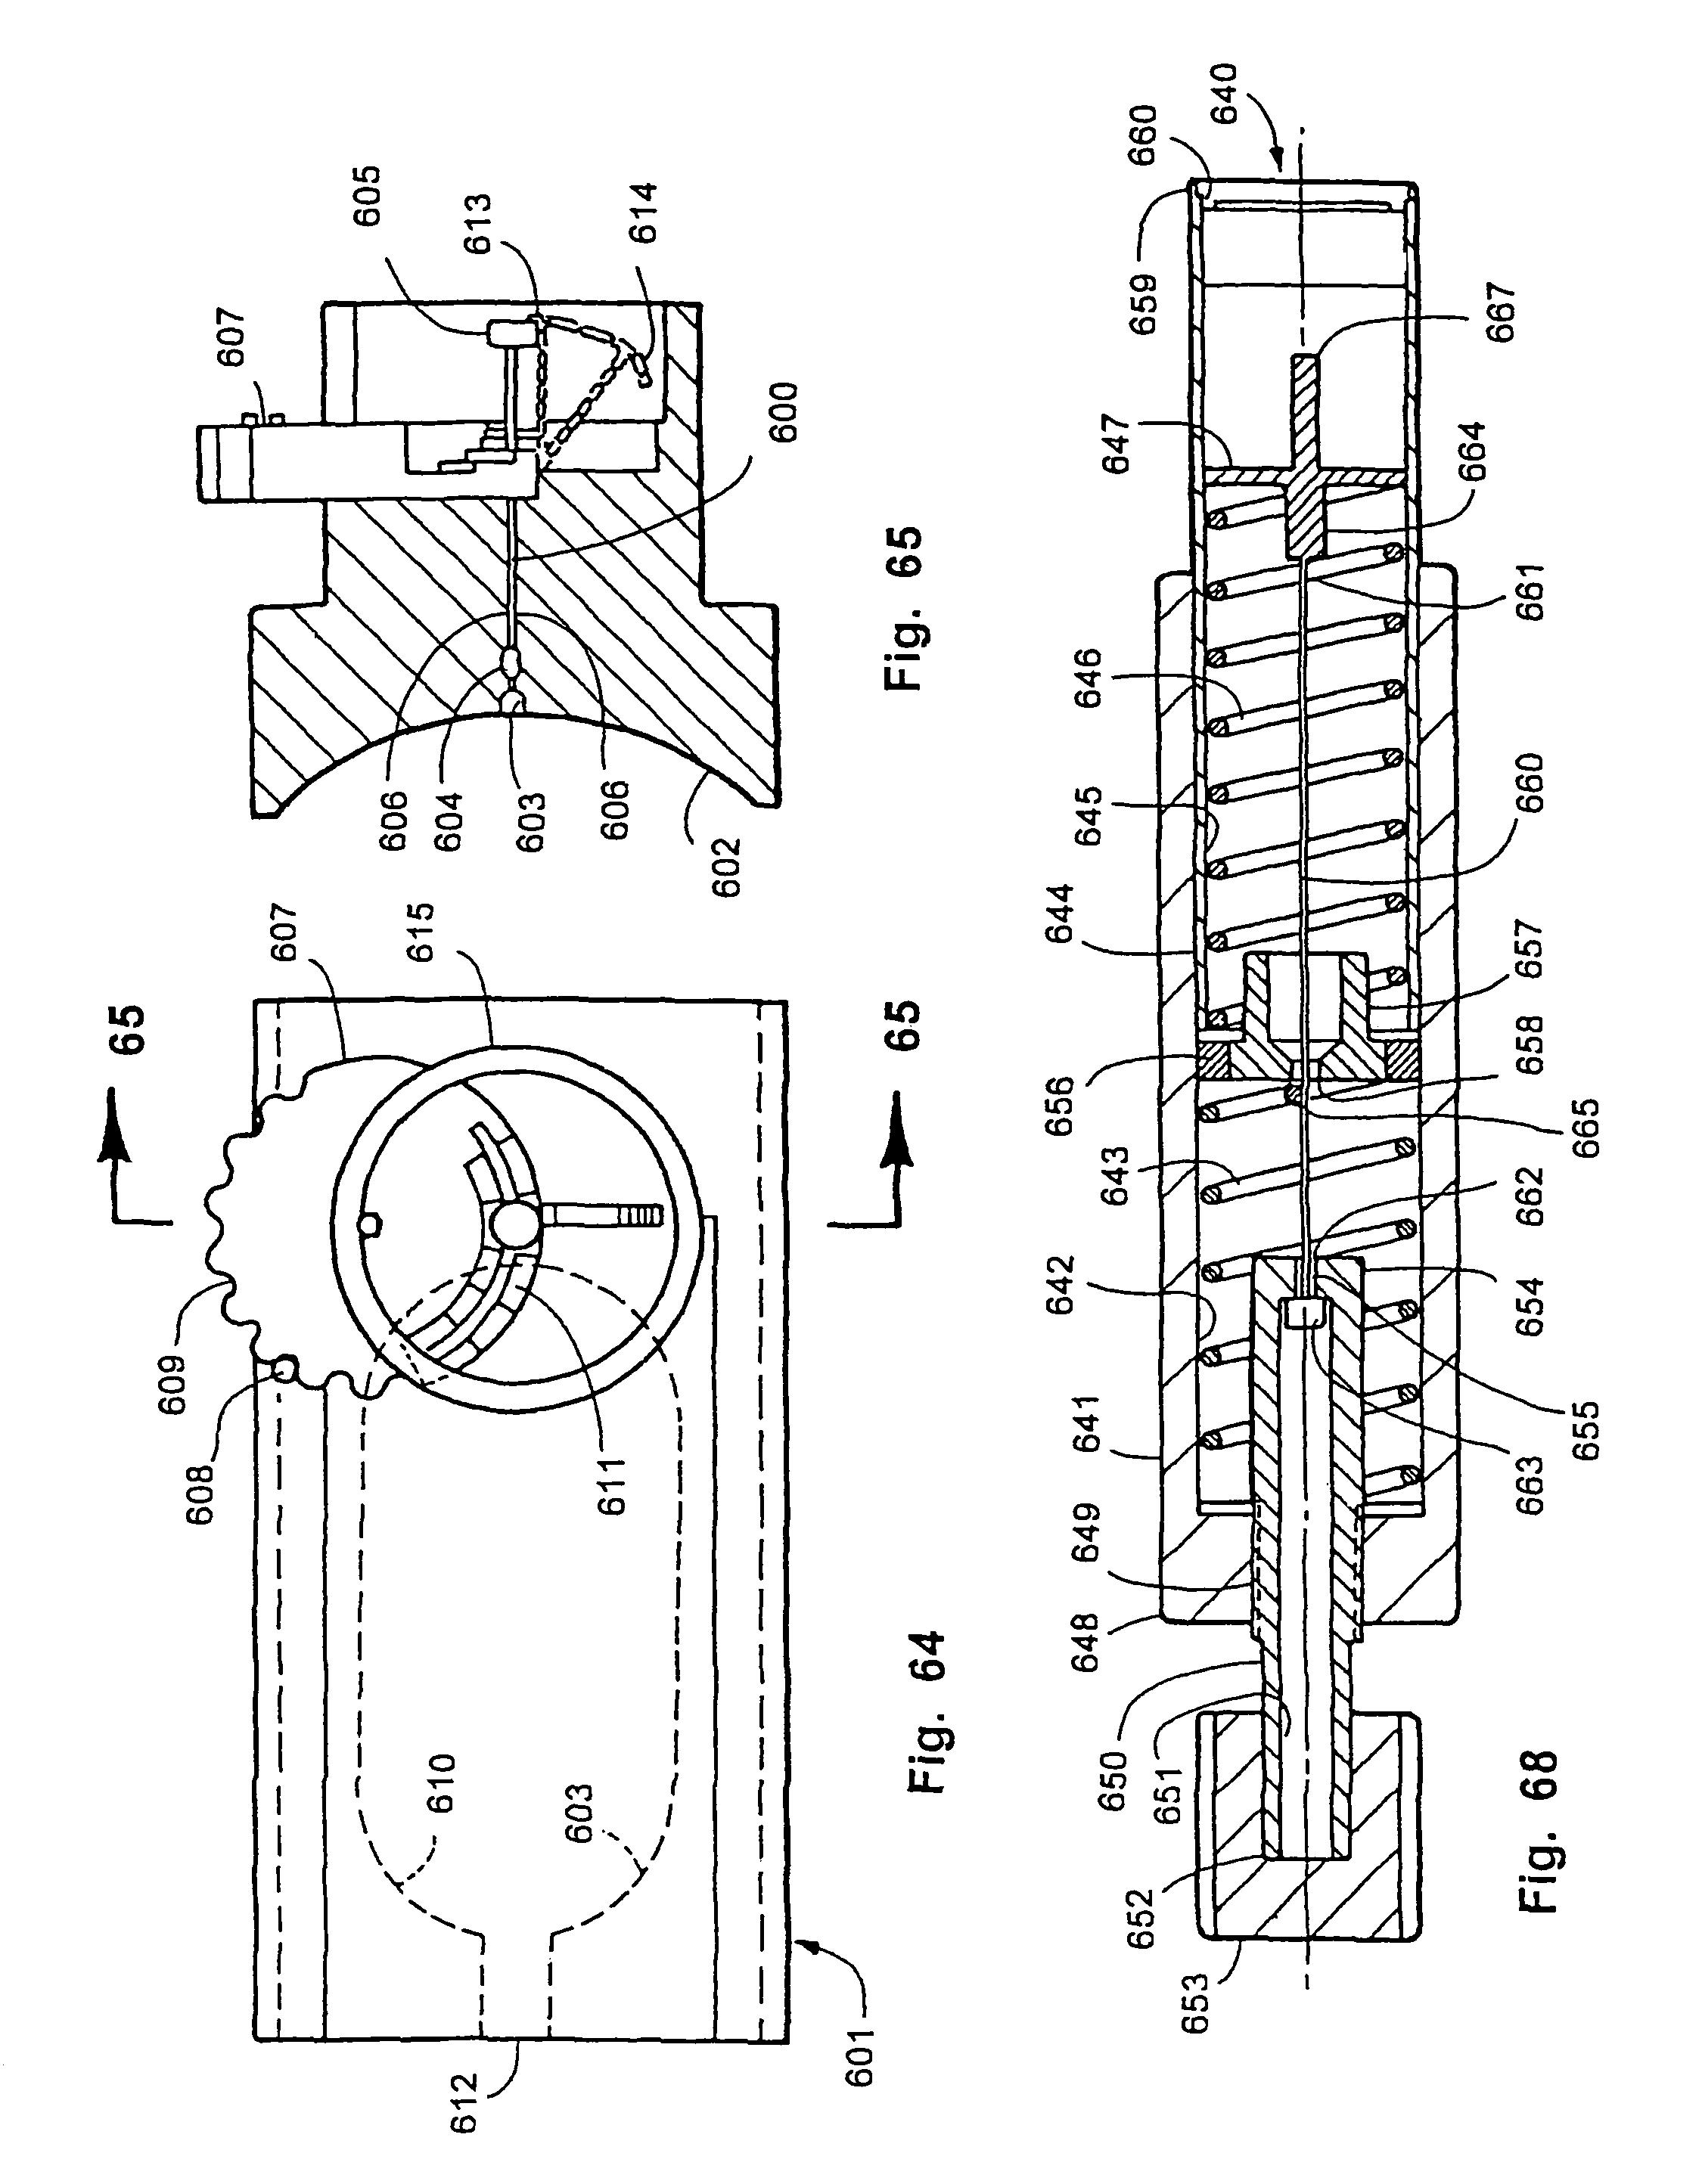 Us7850622b2 Tissue Penetration Device Google Patents Lvdt Wiring Polarity Designation Diagram